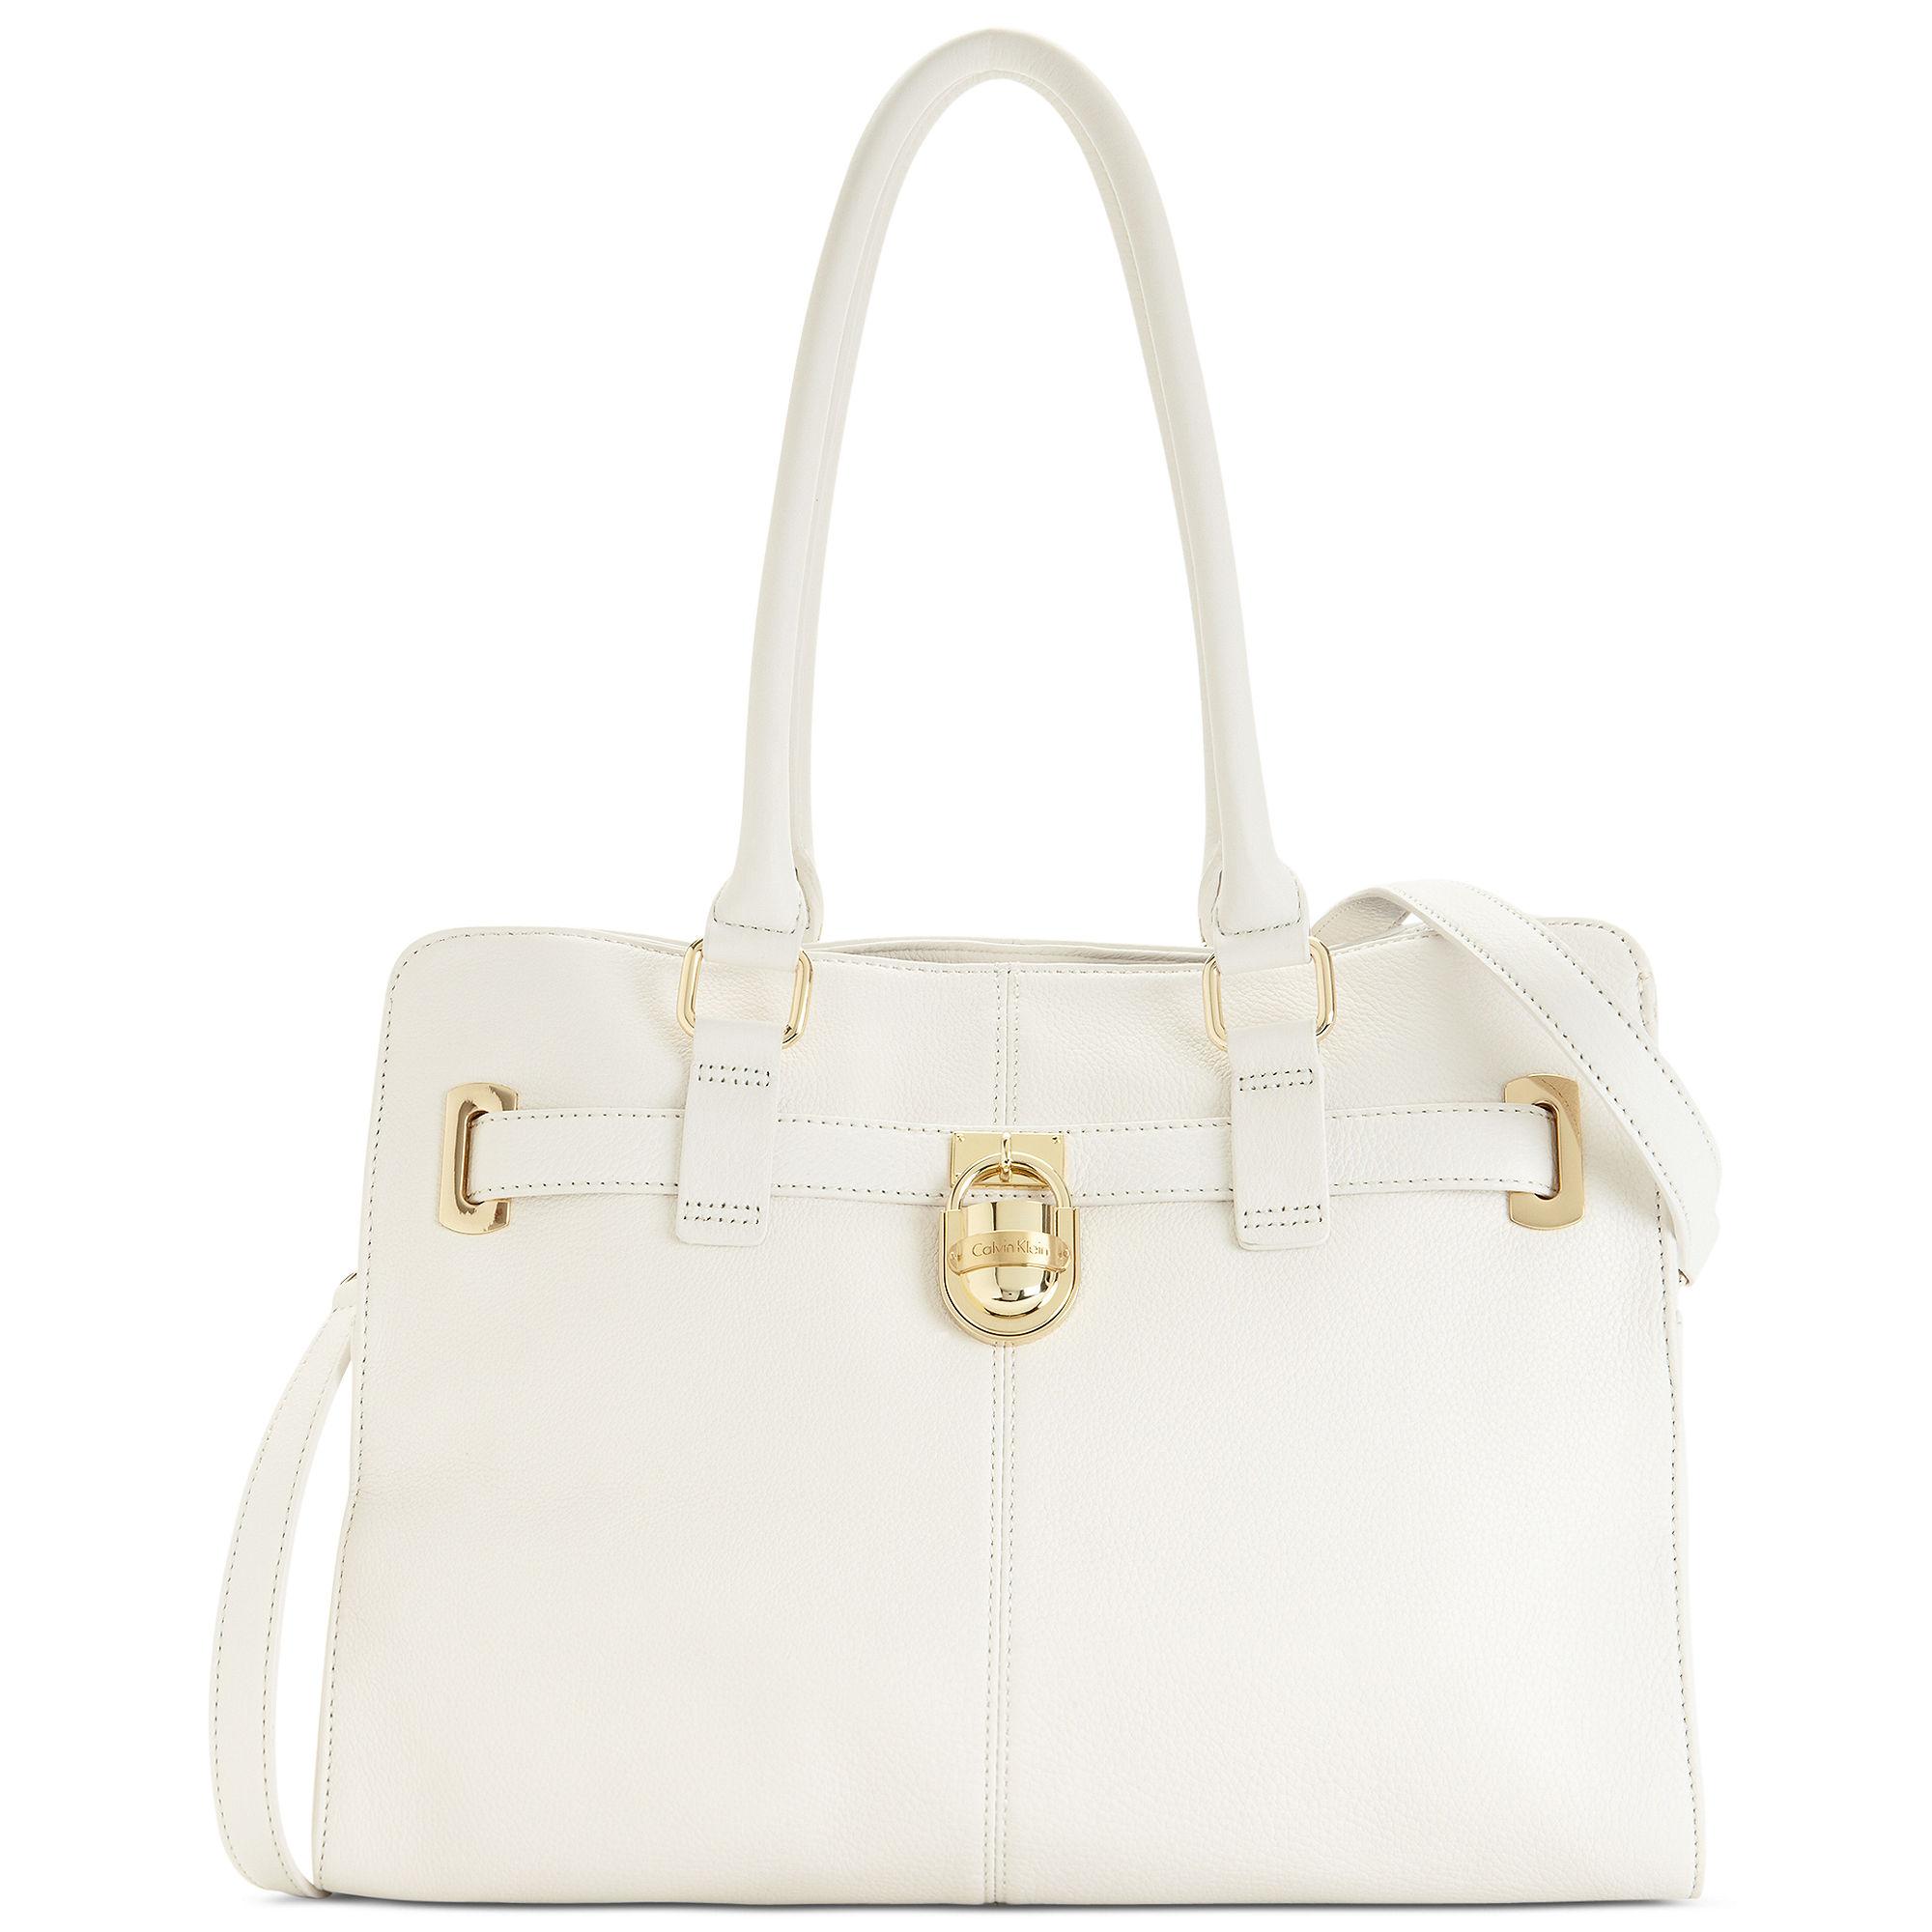 b6c1f55041 Lyst - Calvin Klein Modena Leather Tote in White